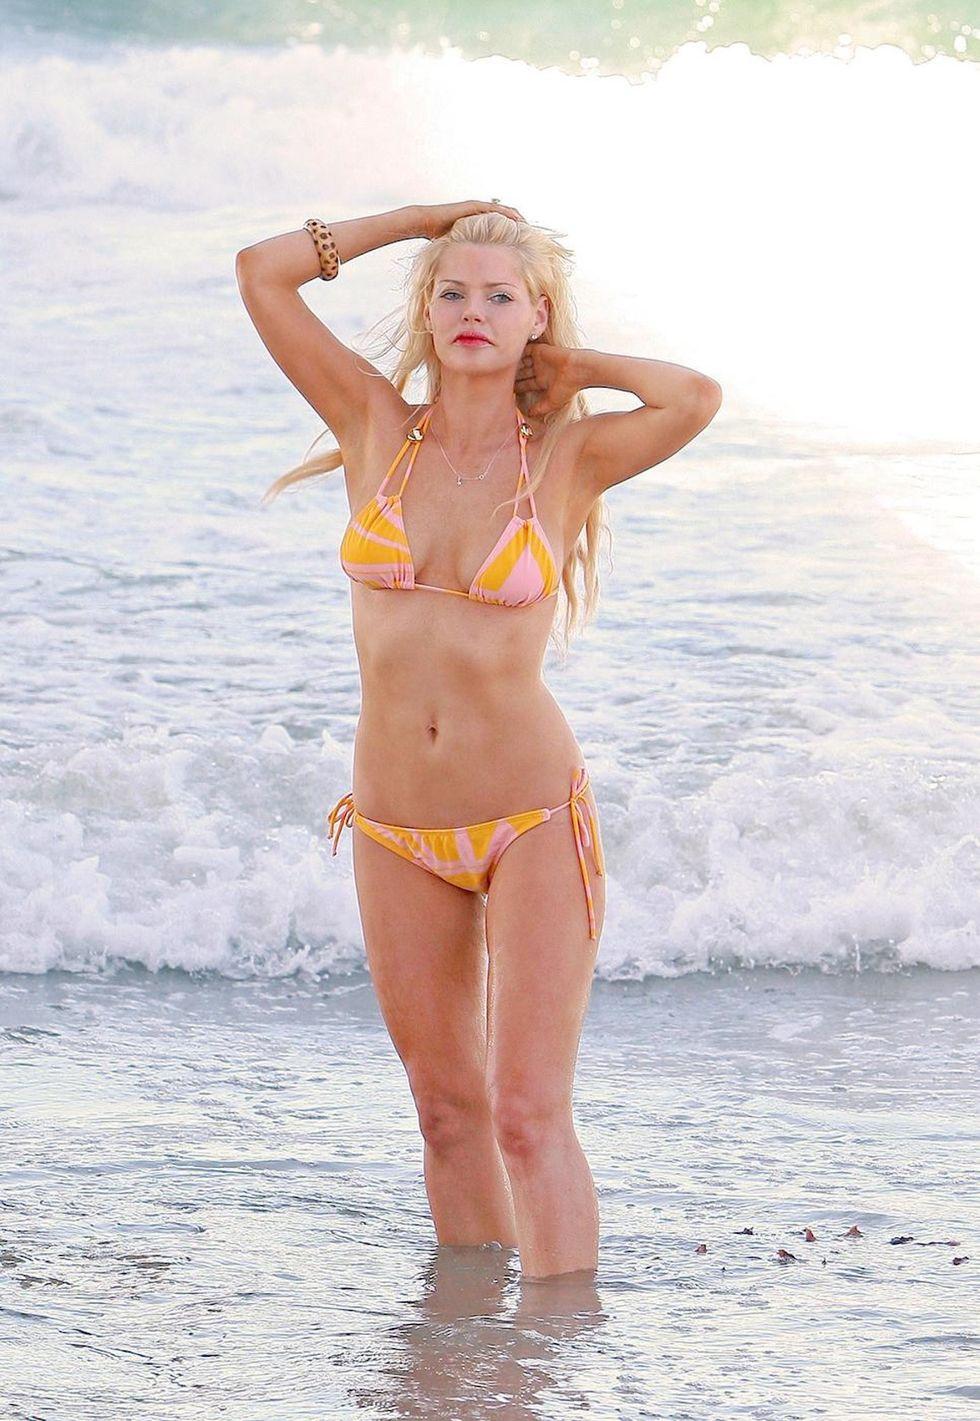 sophie-monk-in-bikini-at-the-beach-in-california-01